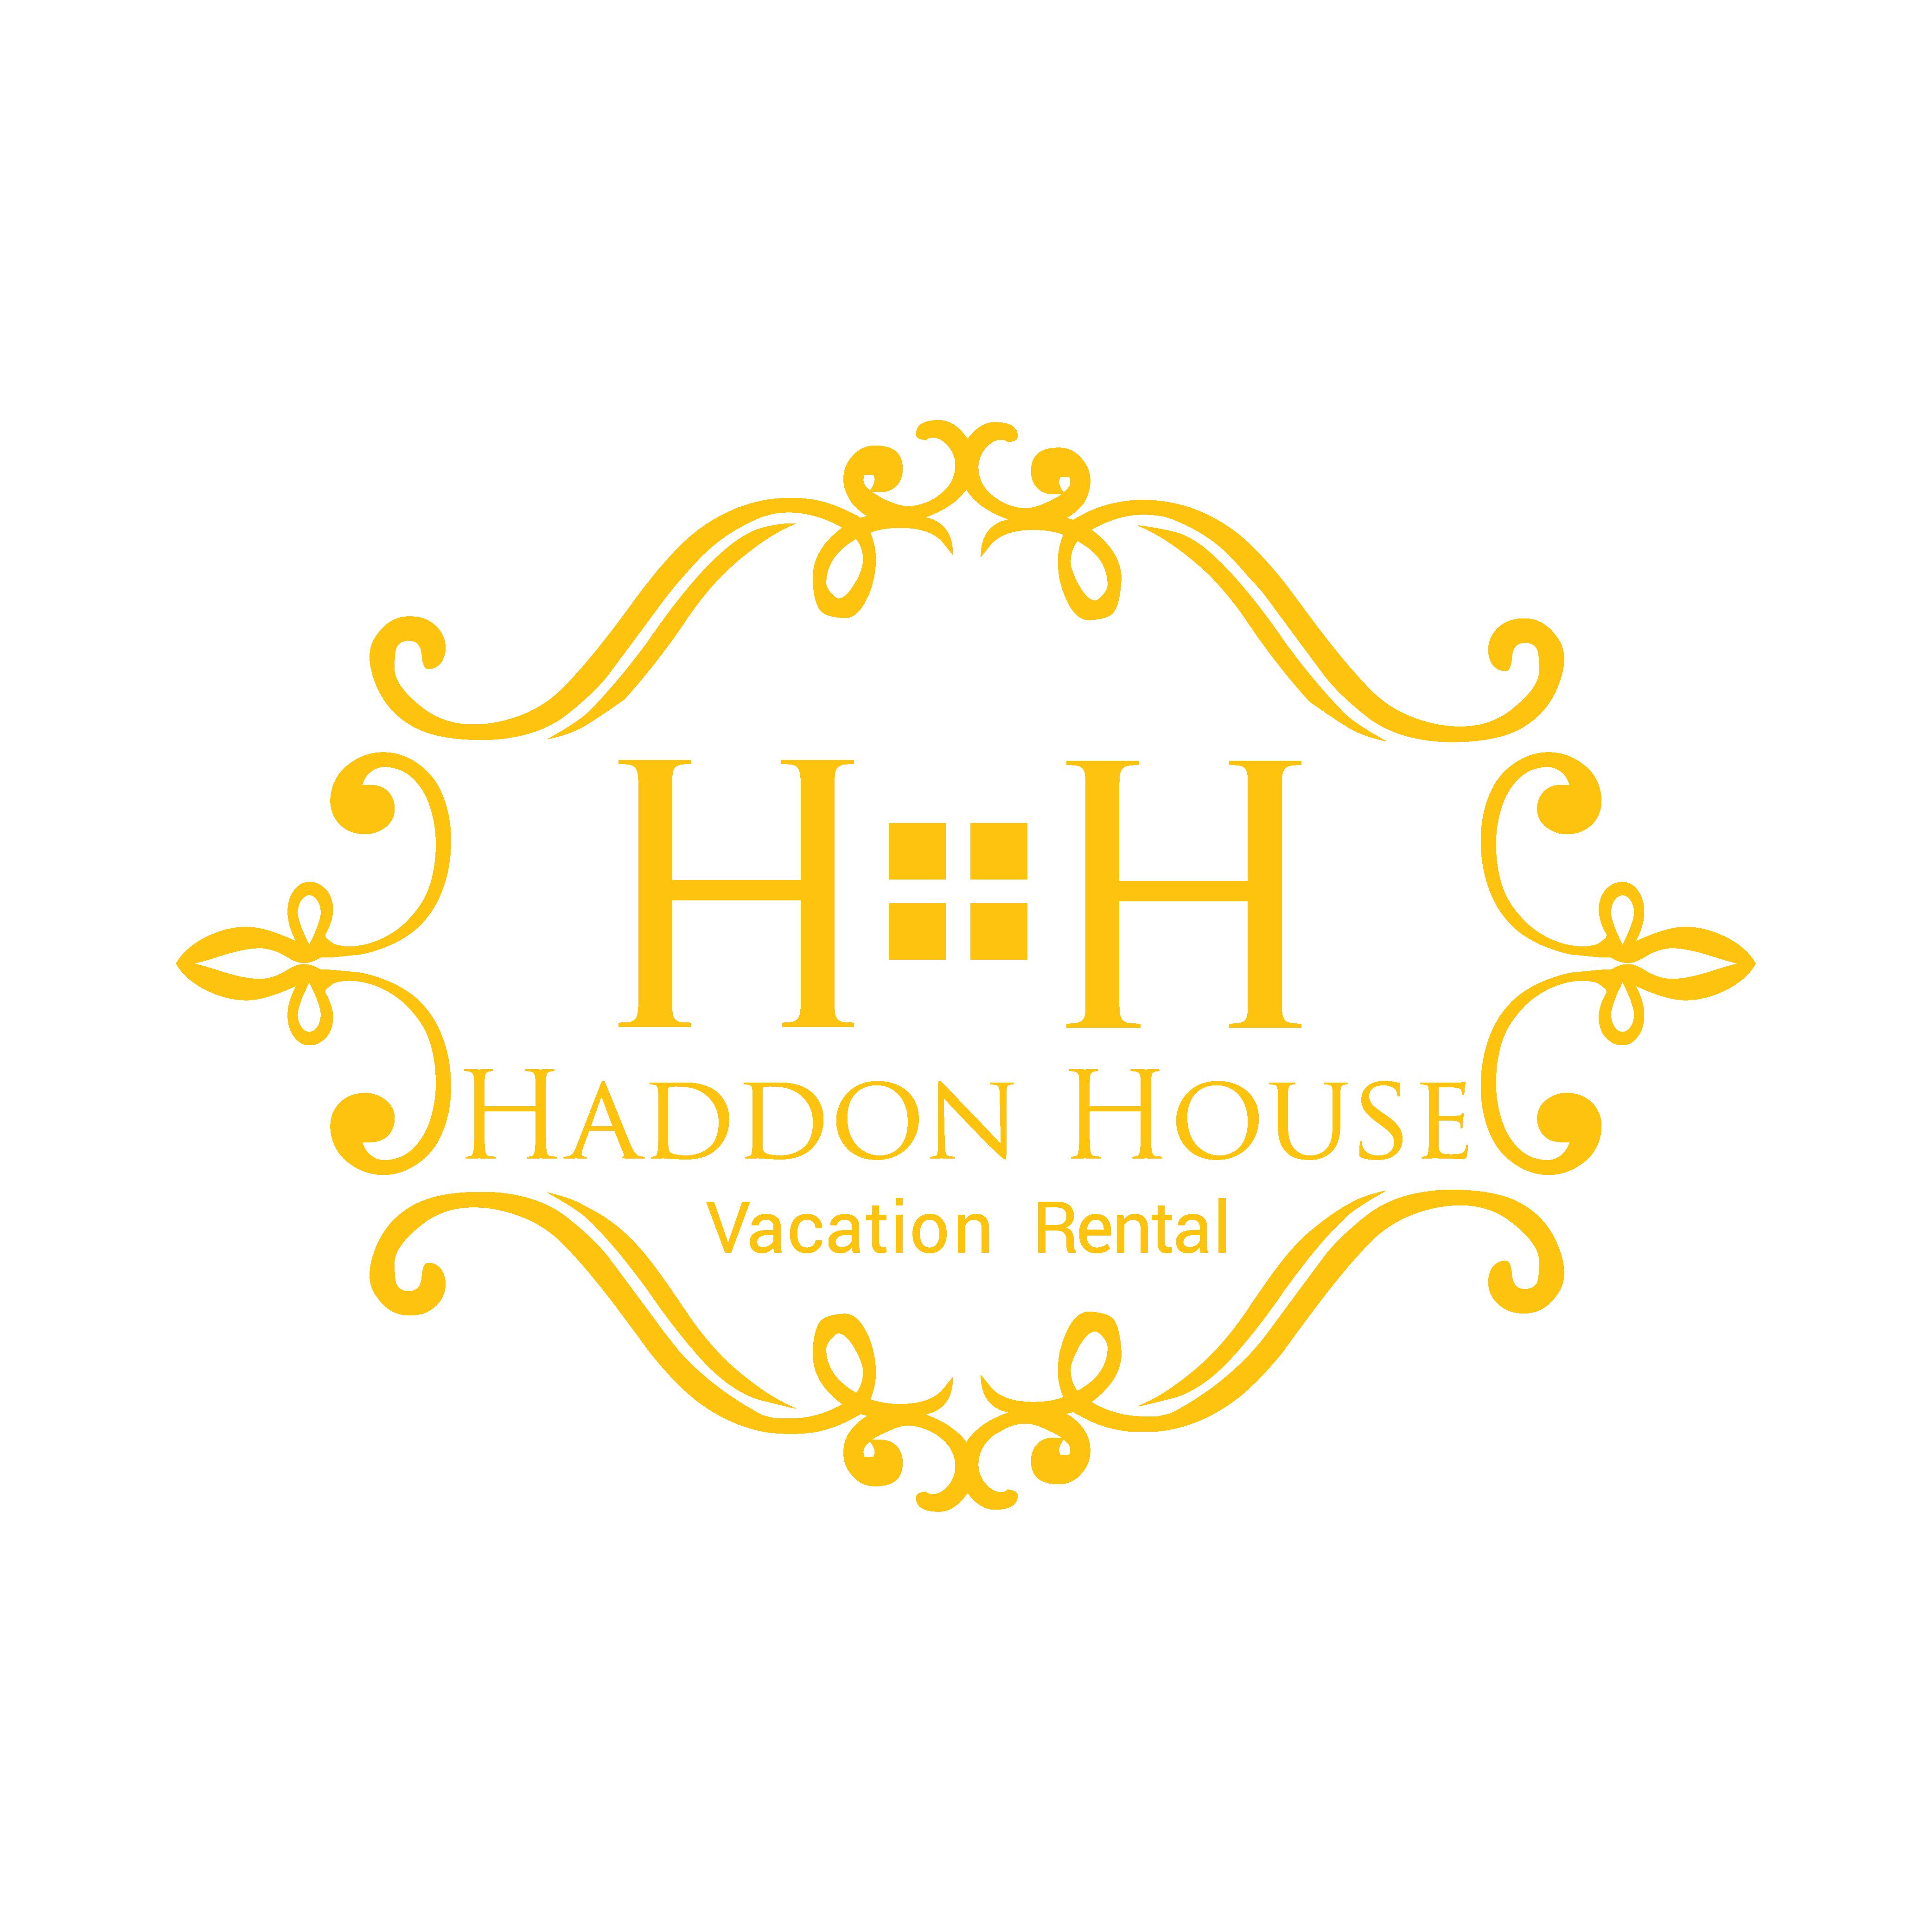 Haddon House